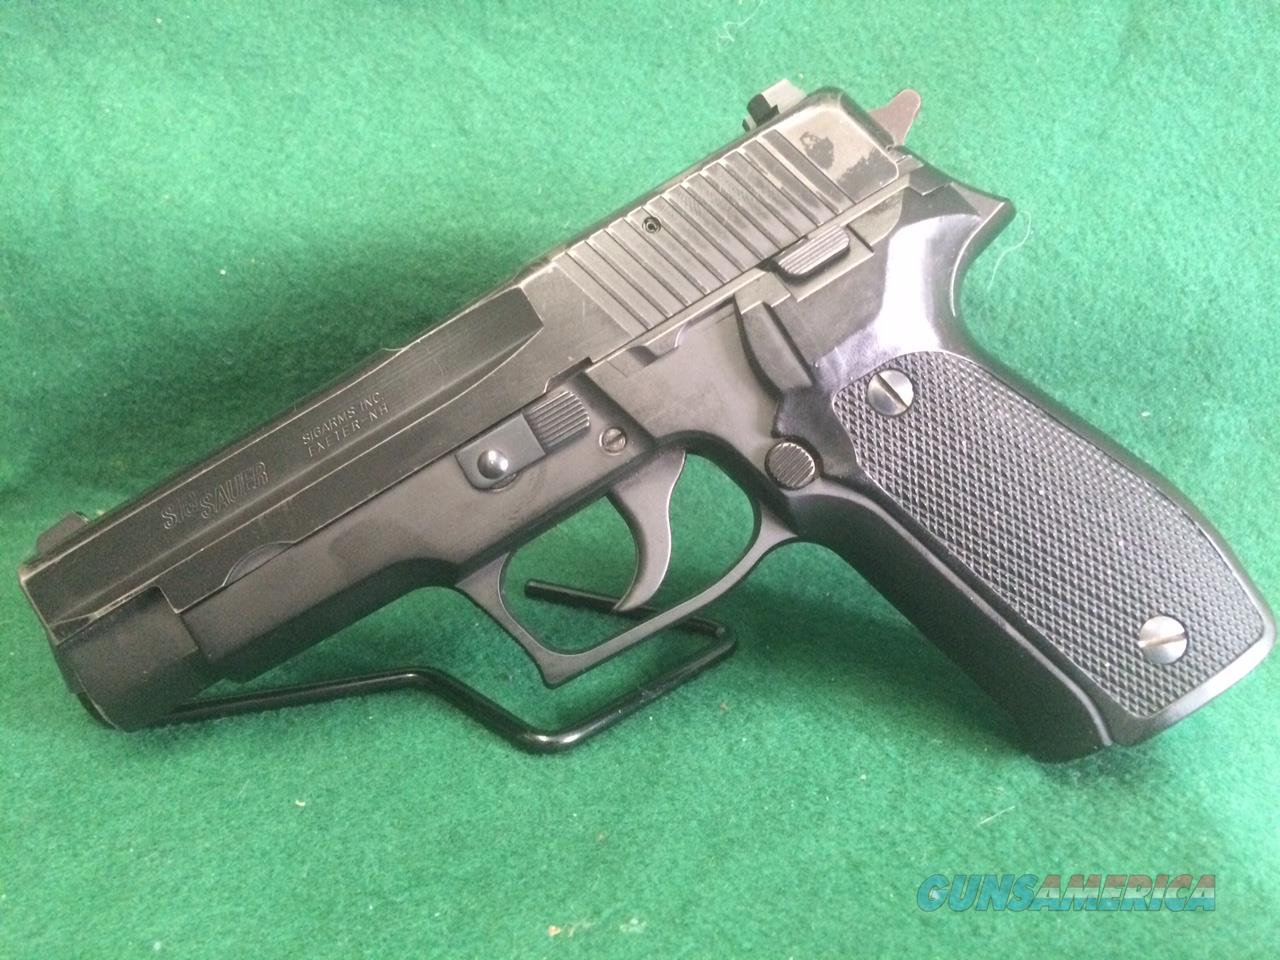 Sig Sauer P226 DAO  Guns > Pistols > Sig - Sauer/Sigarms Pistols > P226